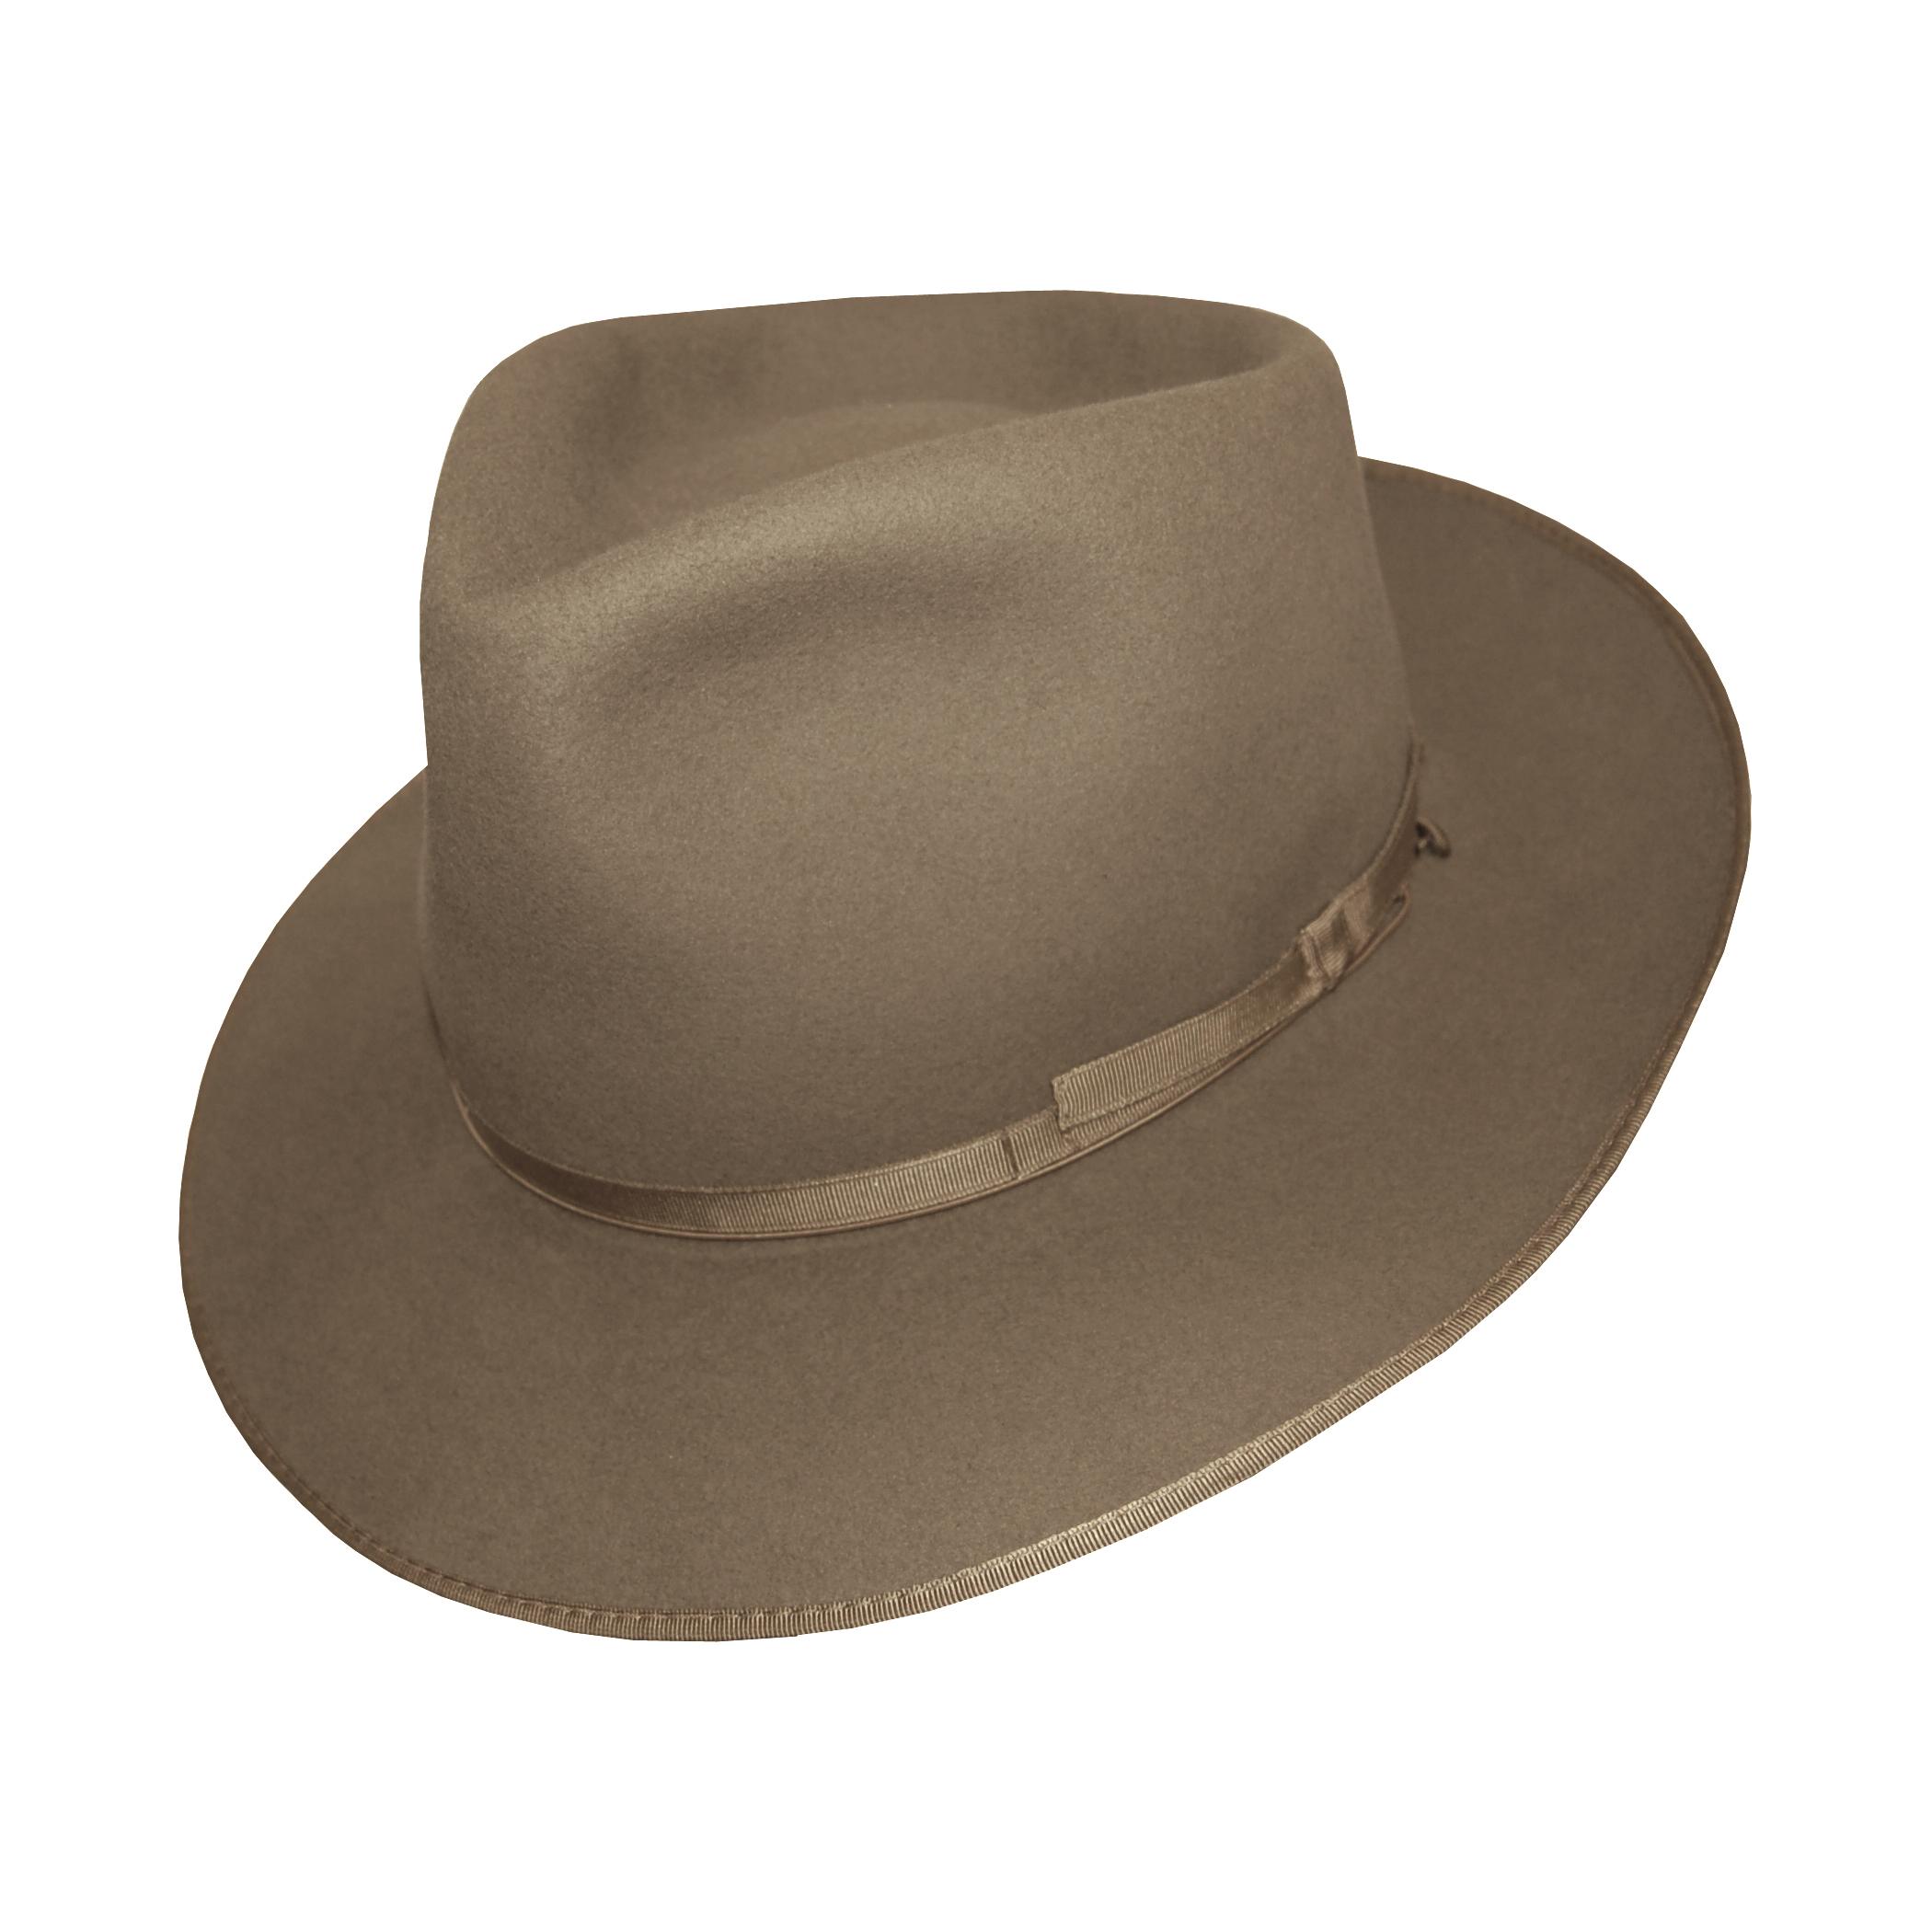 ee988c9fa44 Borsalino Alessandria Fur Felt Hat  DelMonico Hatter